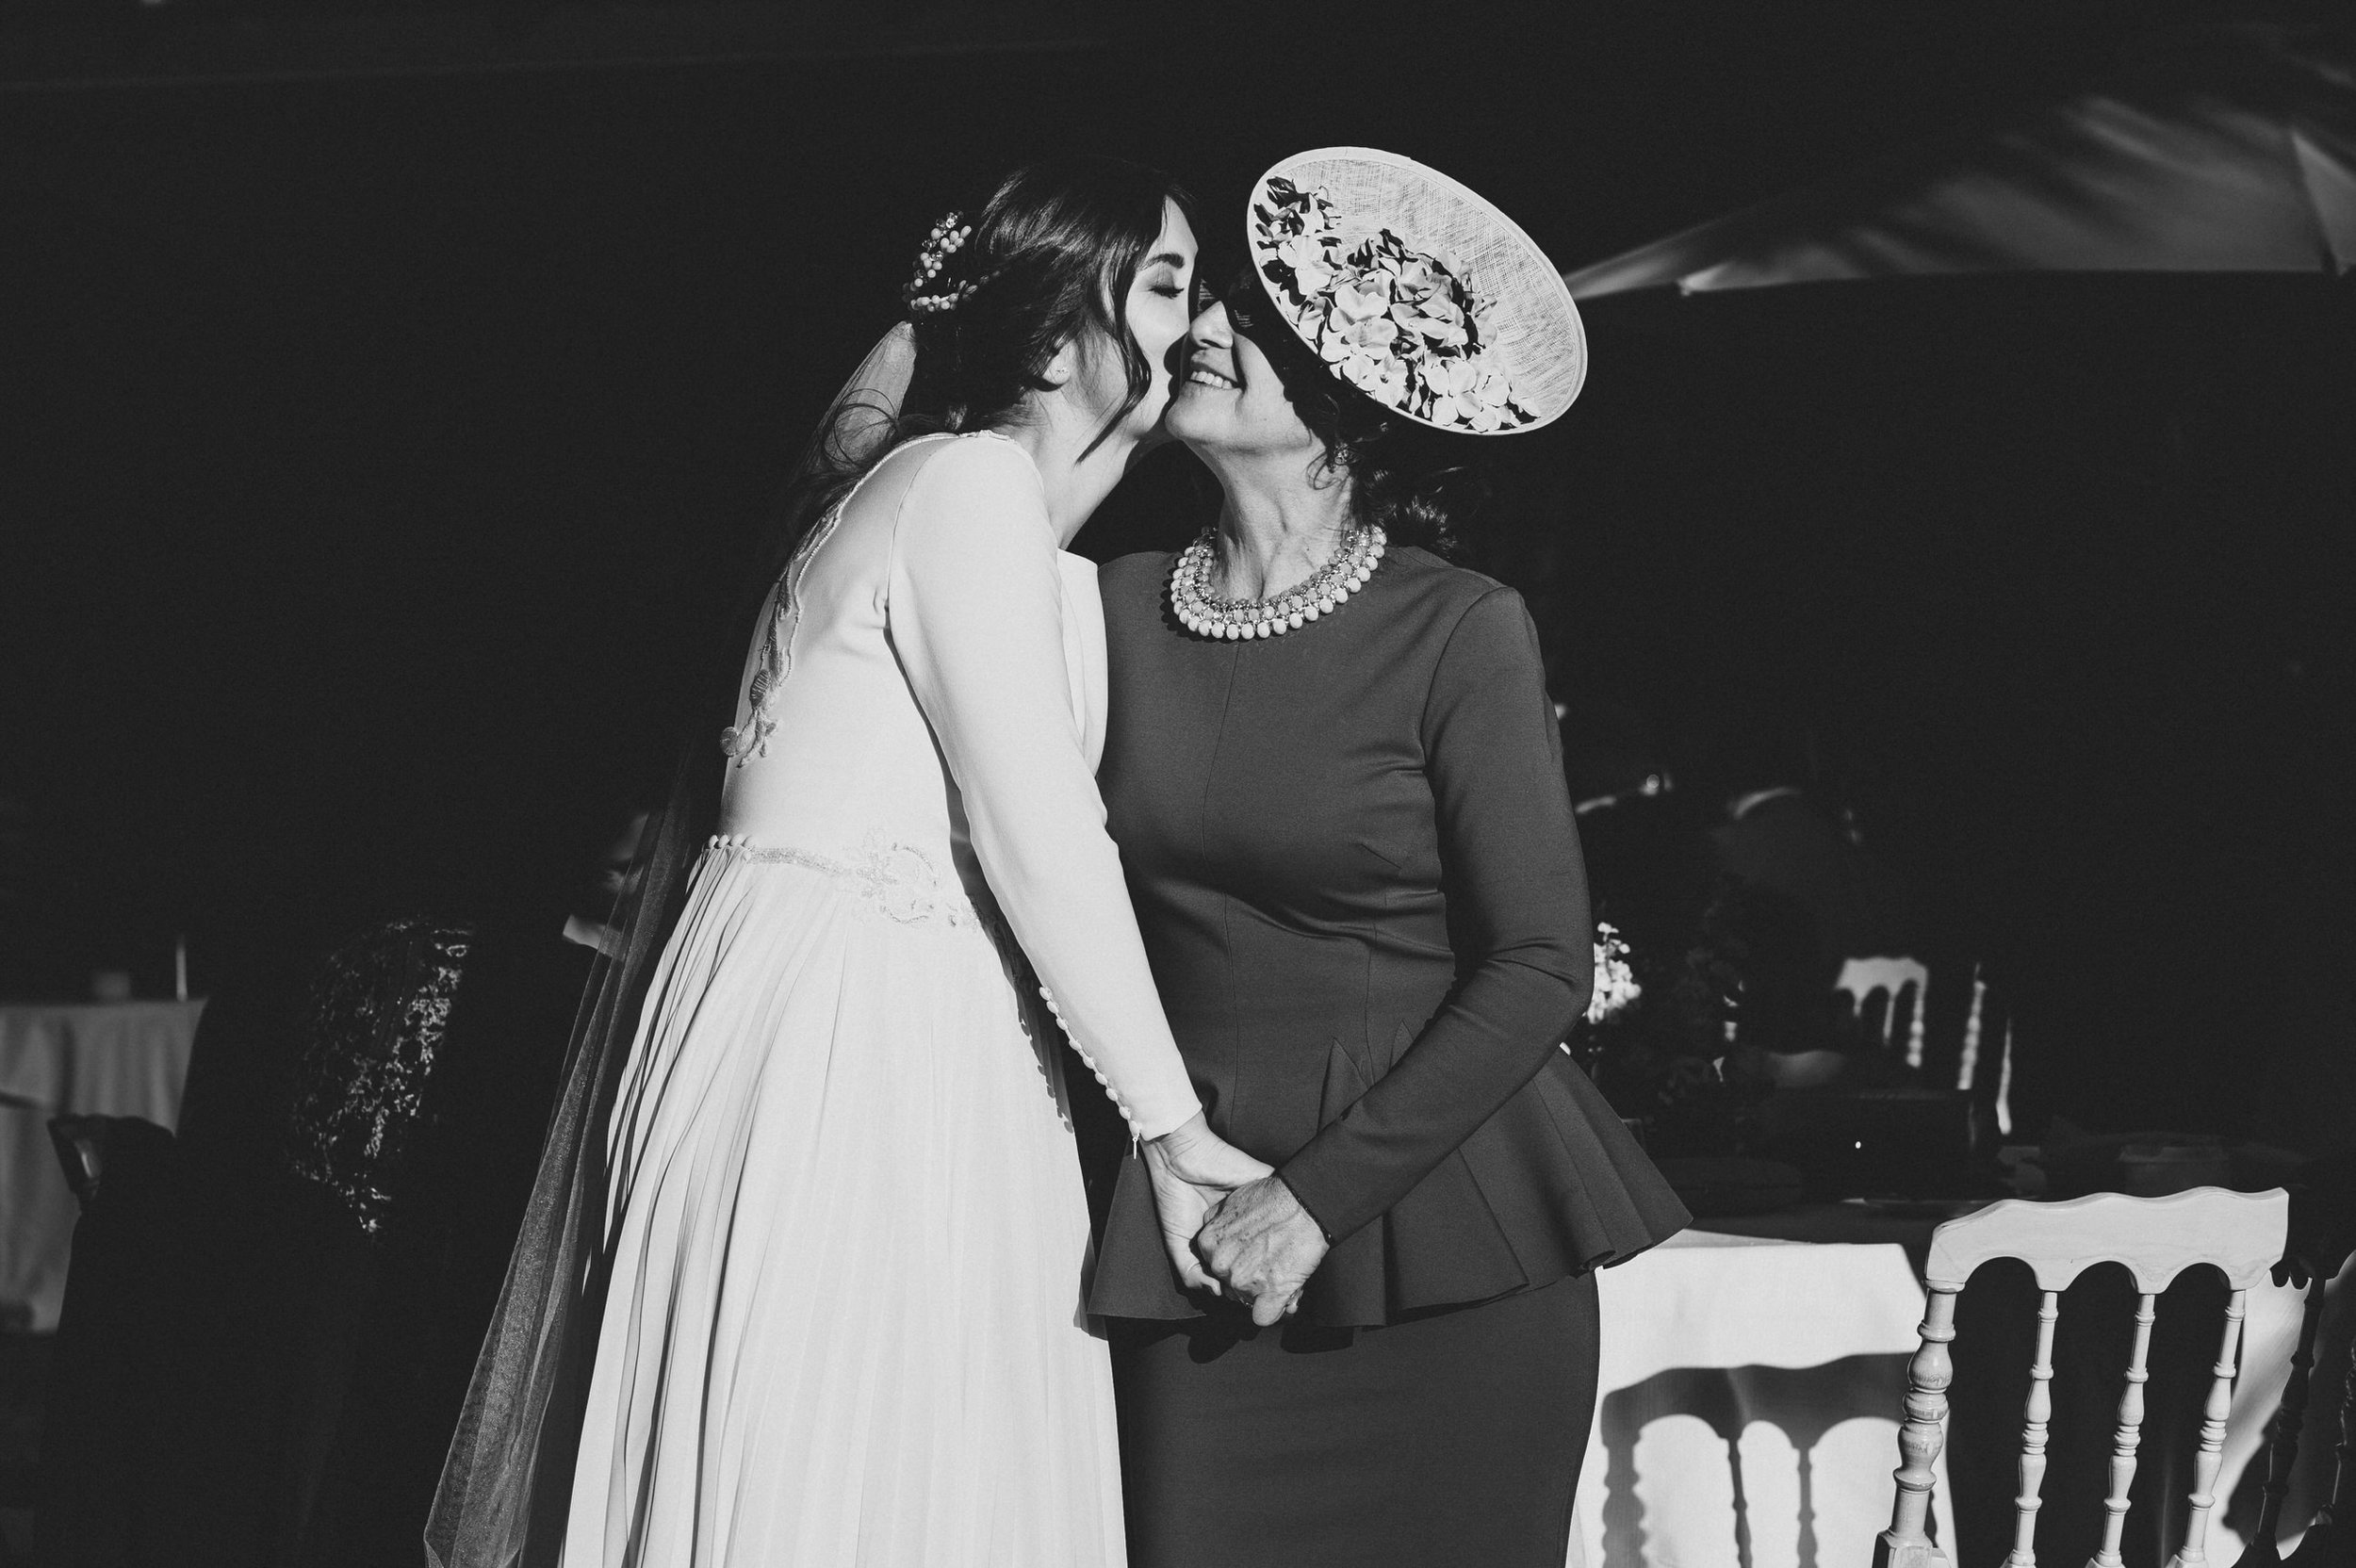 andres+amarillo+fotografo+boda+sevilla+santa+maria+de+la+blanca+al+yamanah (37).JPG